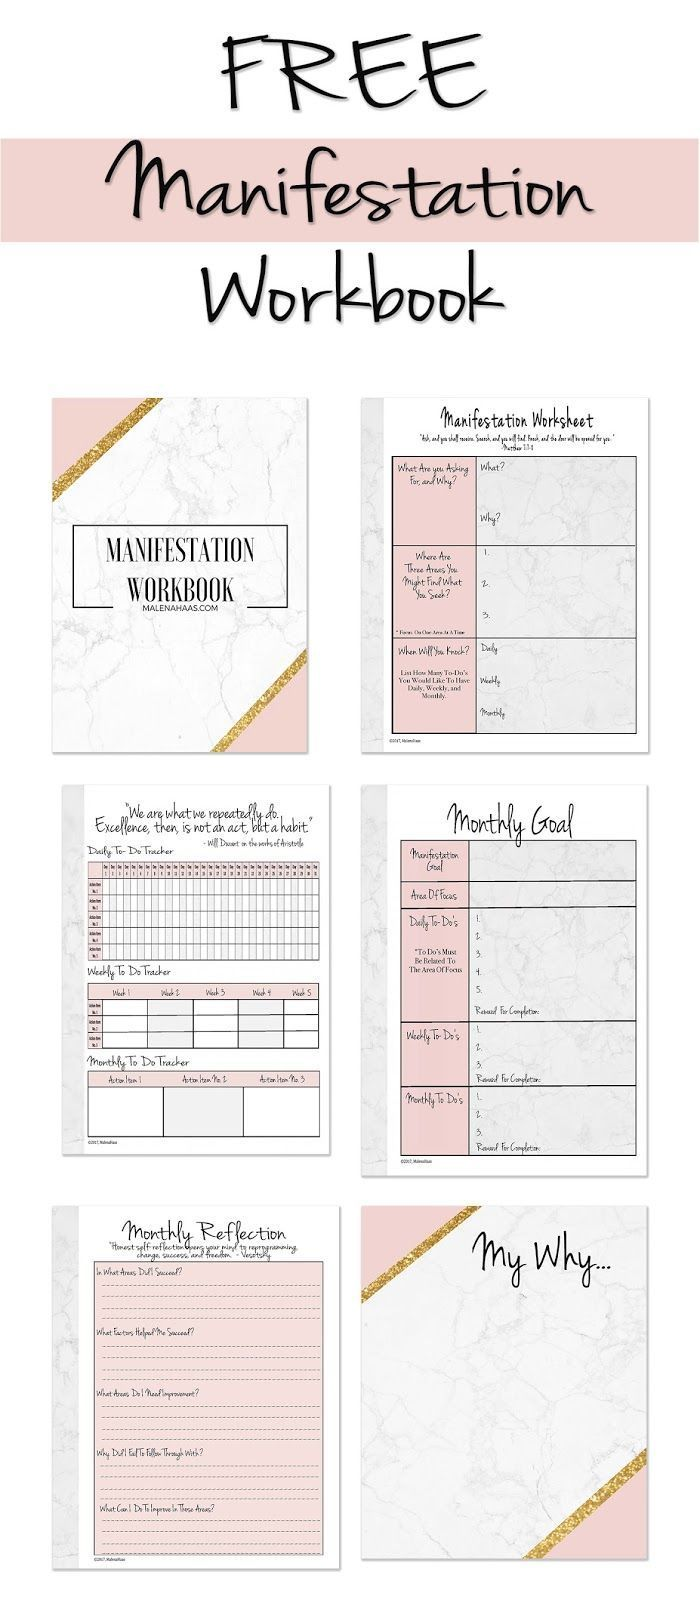 ultimate freebie friday manifestation workbook  how to